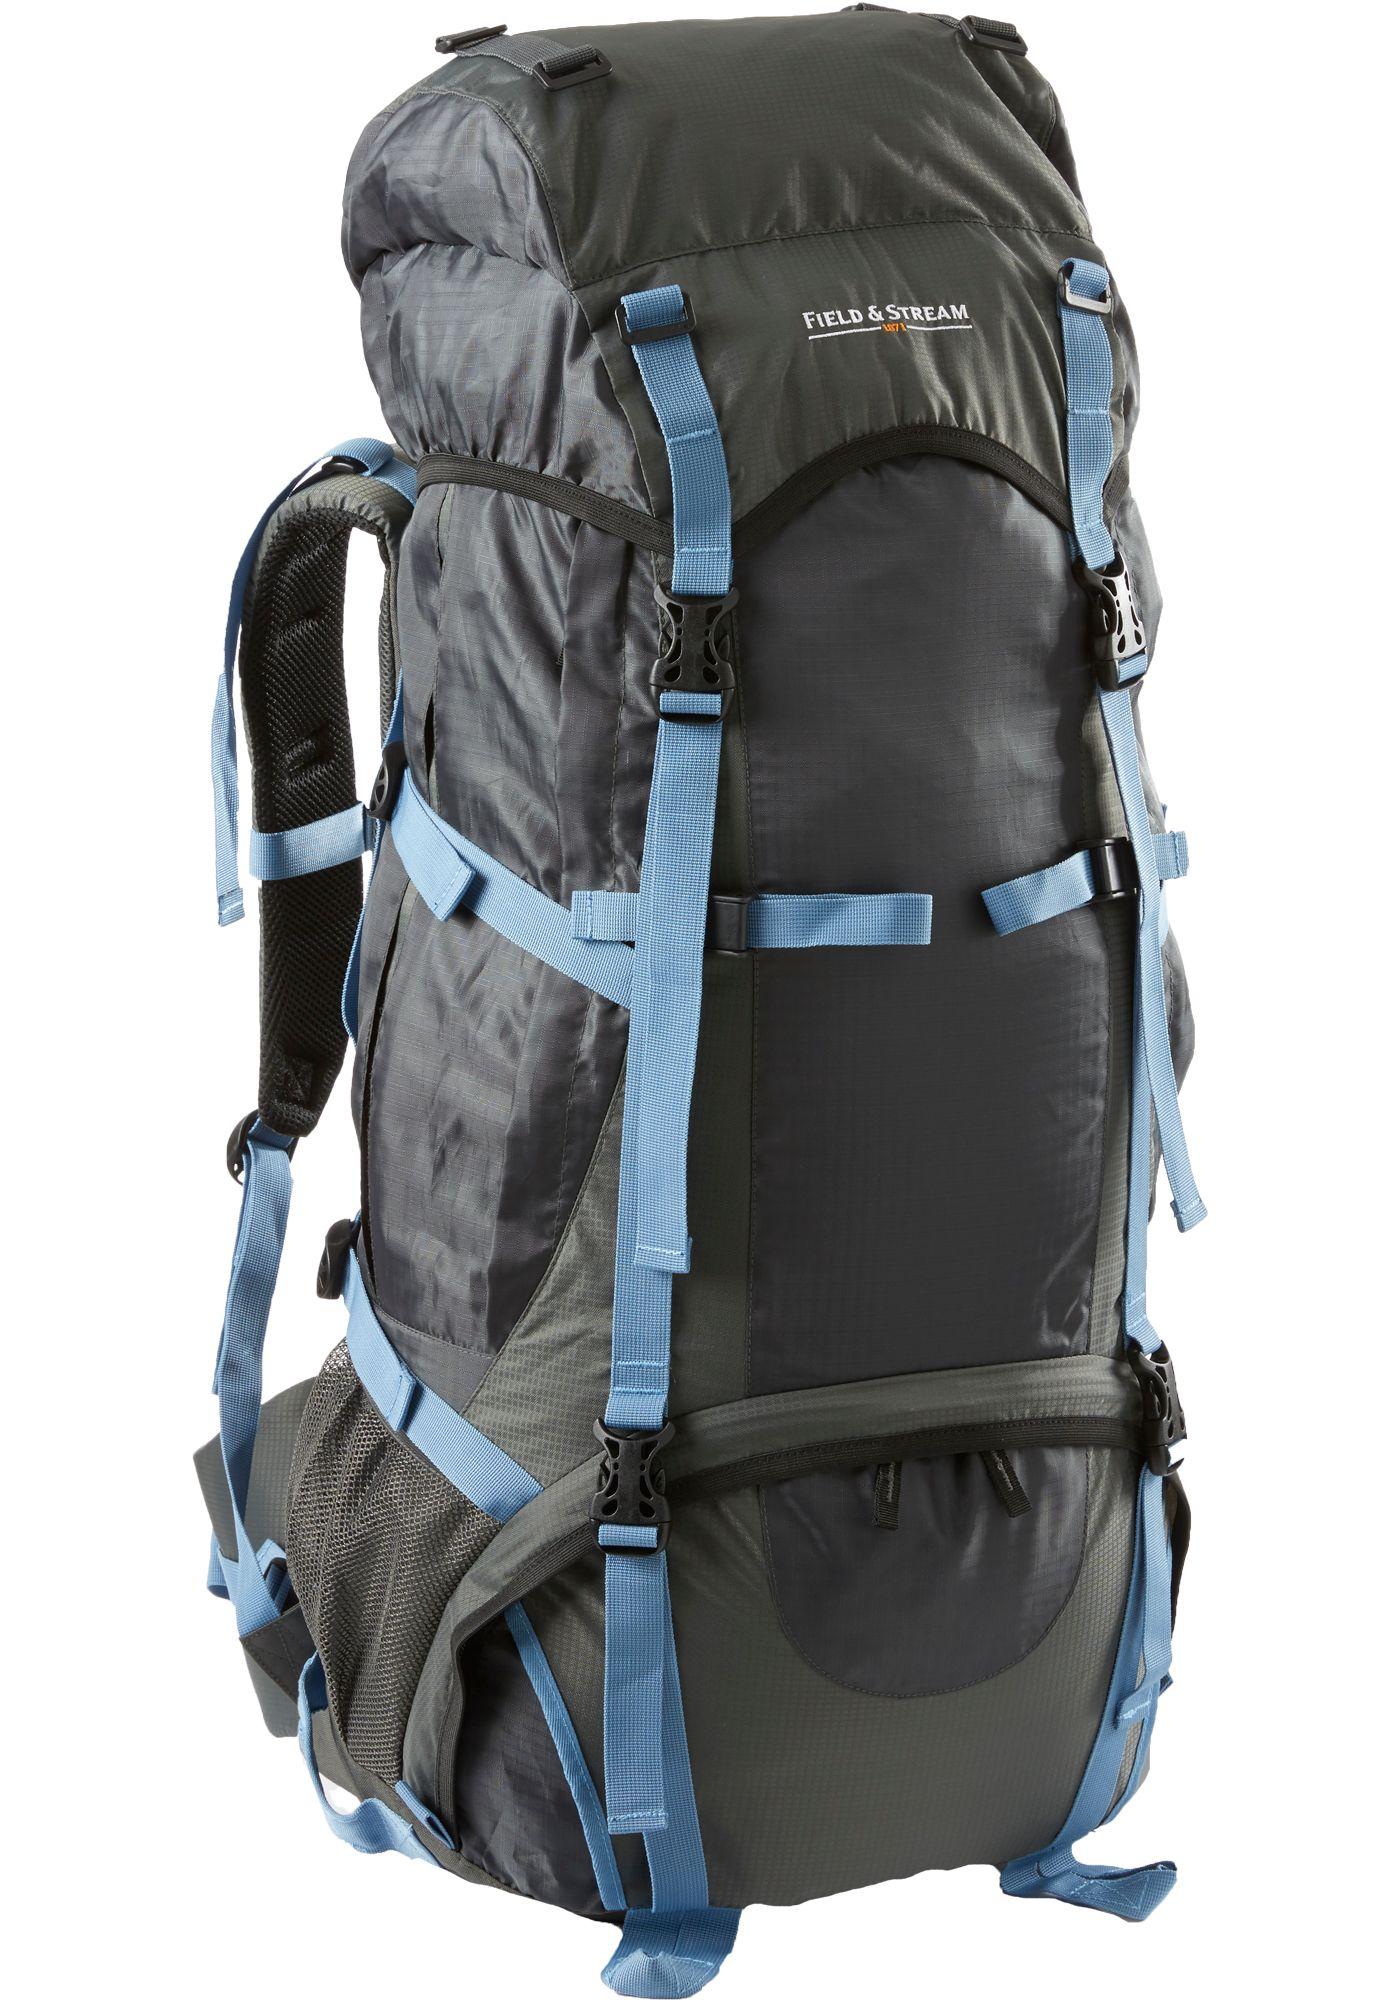 Field & Stream Mountain Scout 65L Internal Frame Pack